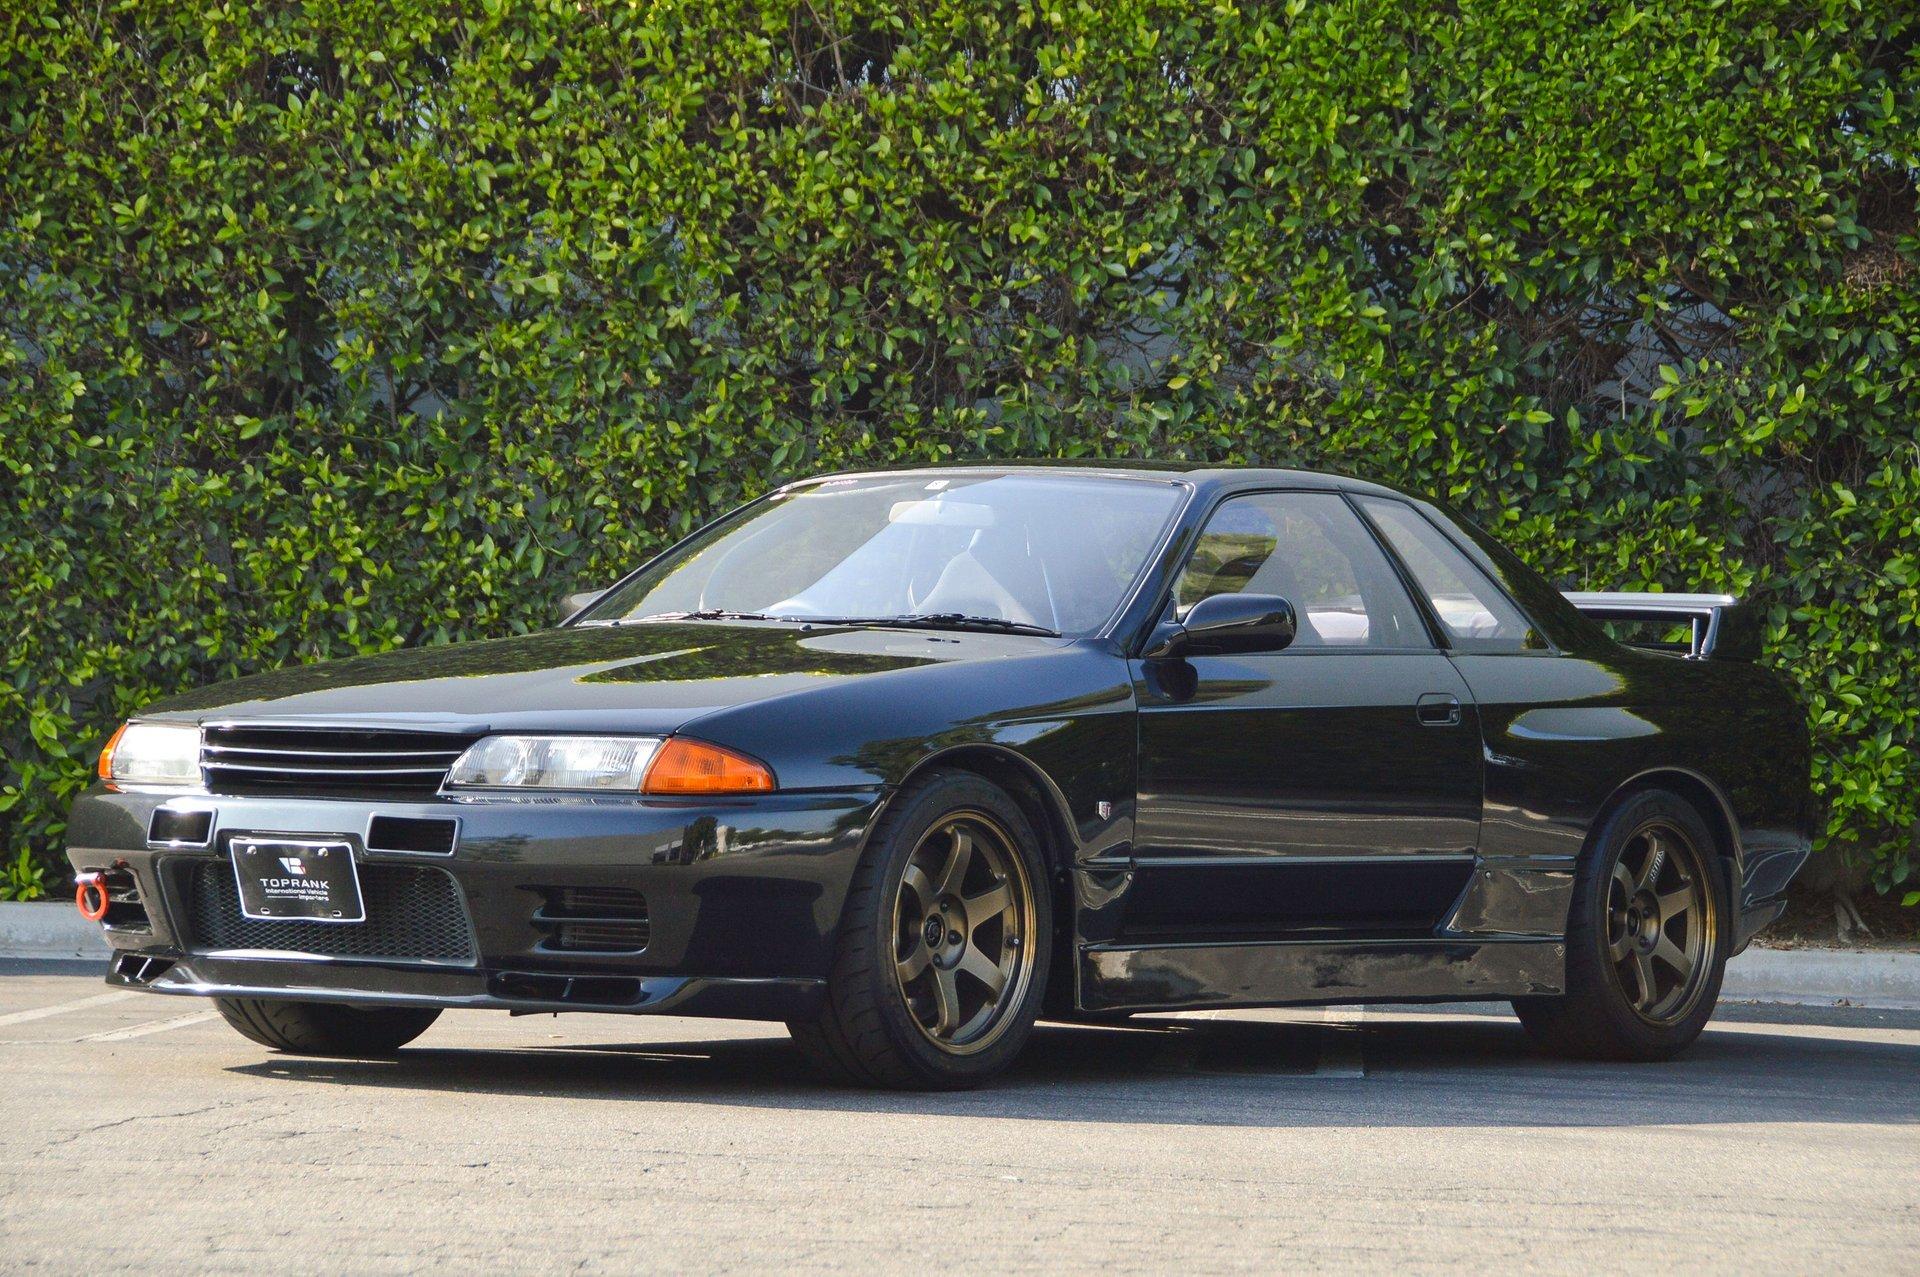 1994 Nissan GT-R